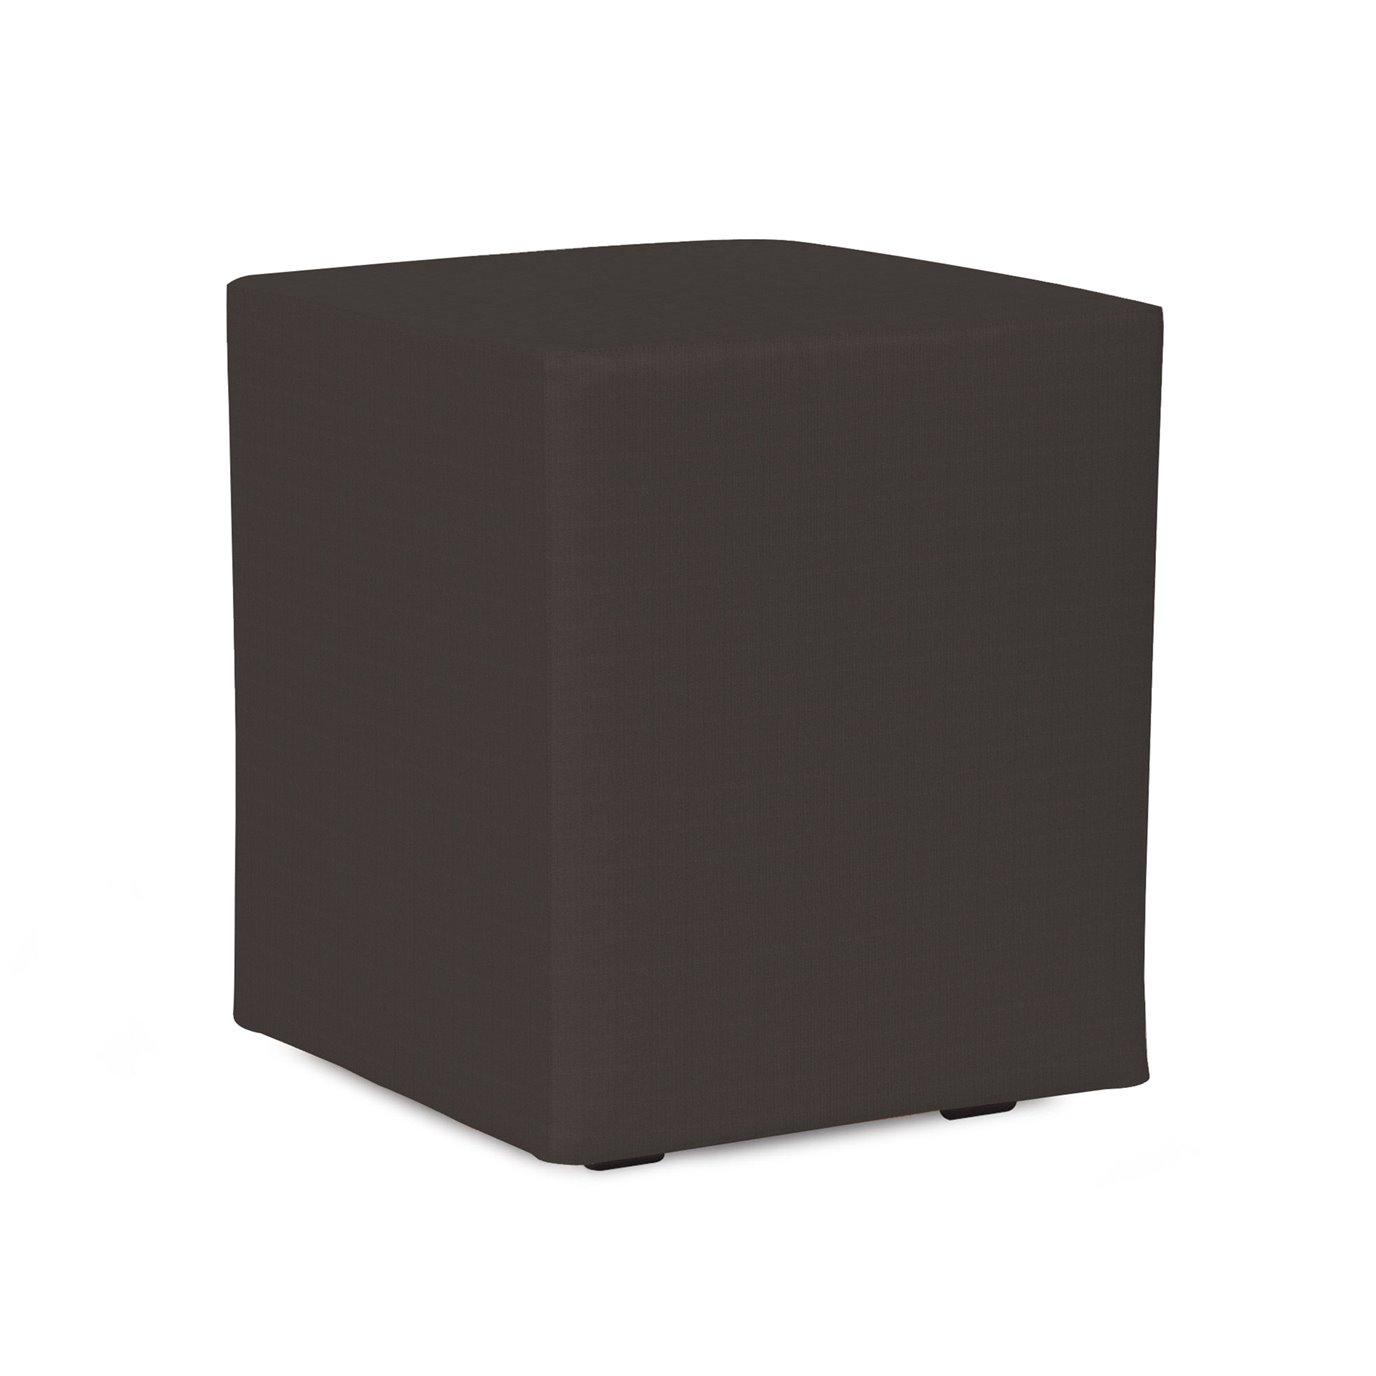 Howard Elliott Universal Cube Outdoor Sunbrella Seascape Charcoal Complete Ottoman